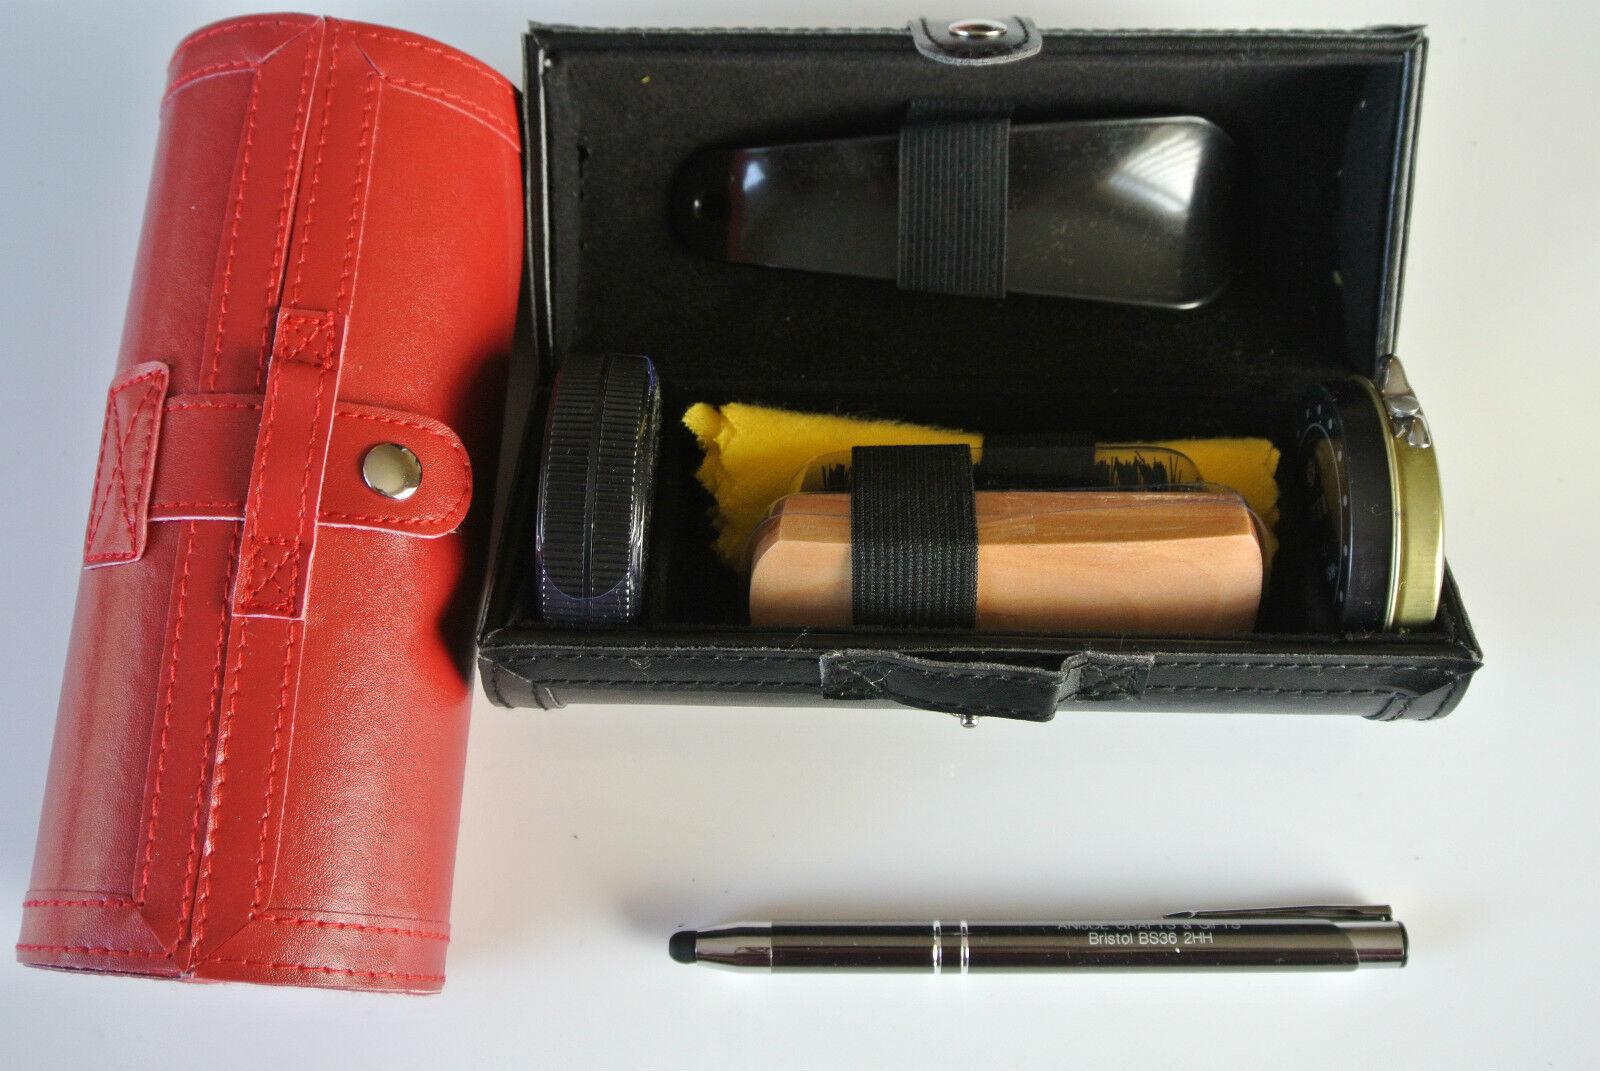 Shoe Shine Kit, LeatherLook Case, Fathers Day gift, travel,birthday,son,men